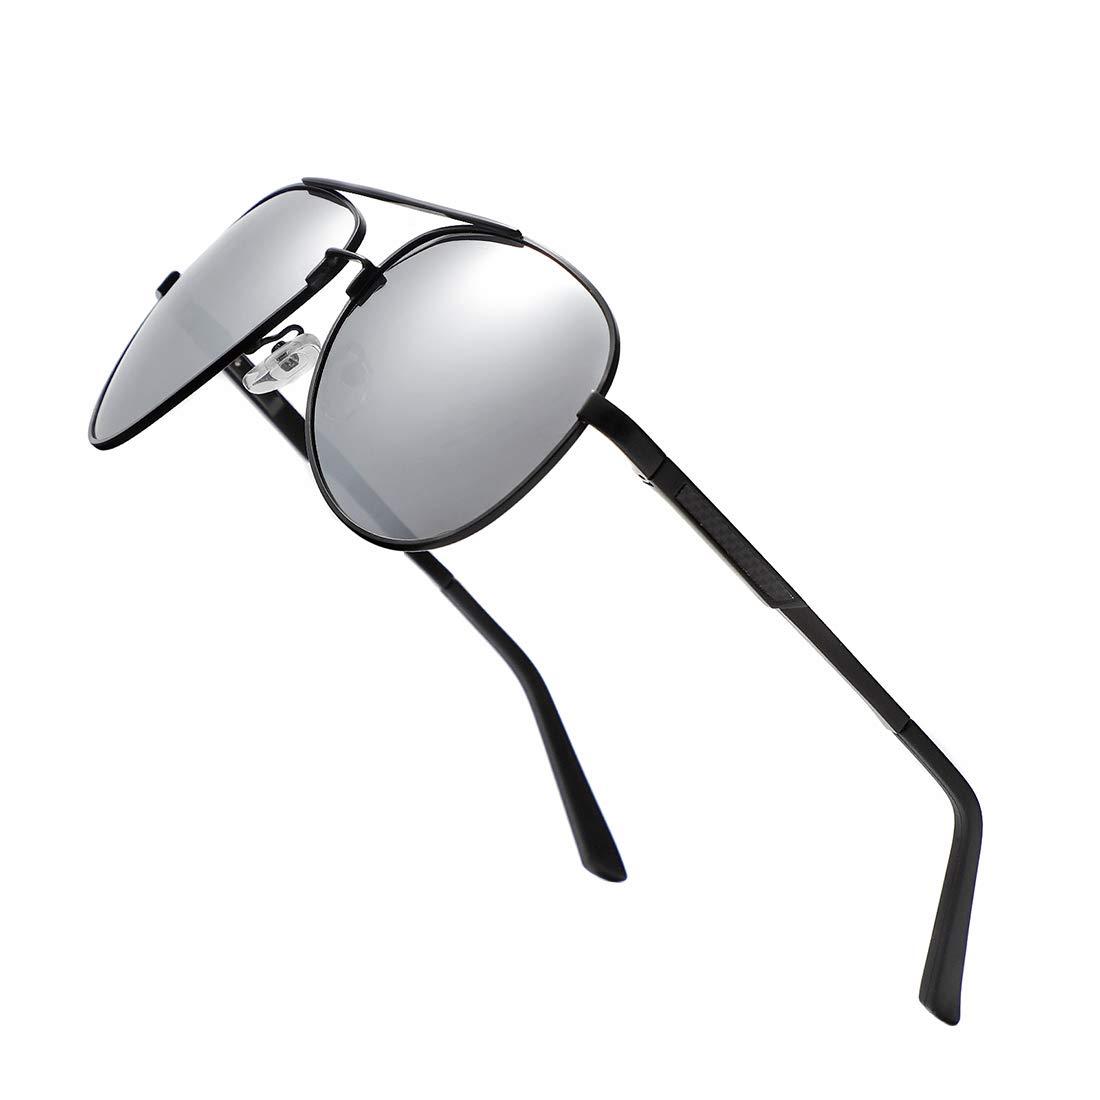 Blacksilver Aviator Polarized Sunglasses for Men Women  UV400 Mirrored Glasses Shades 60mm